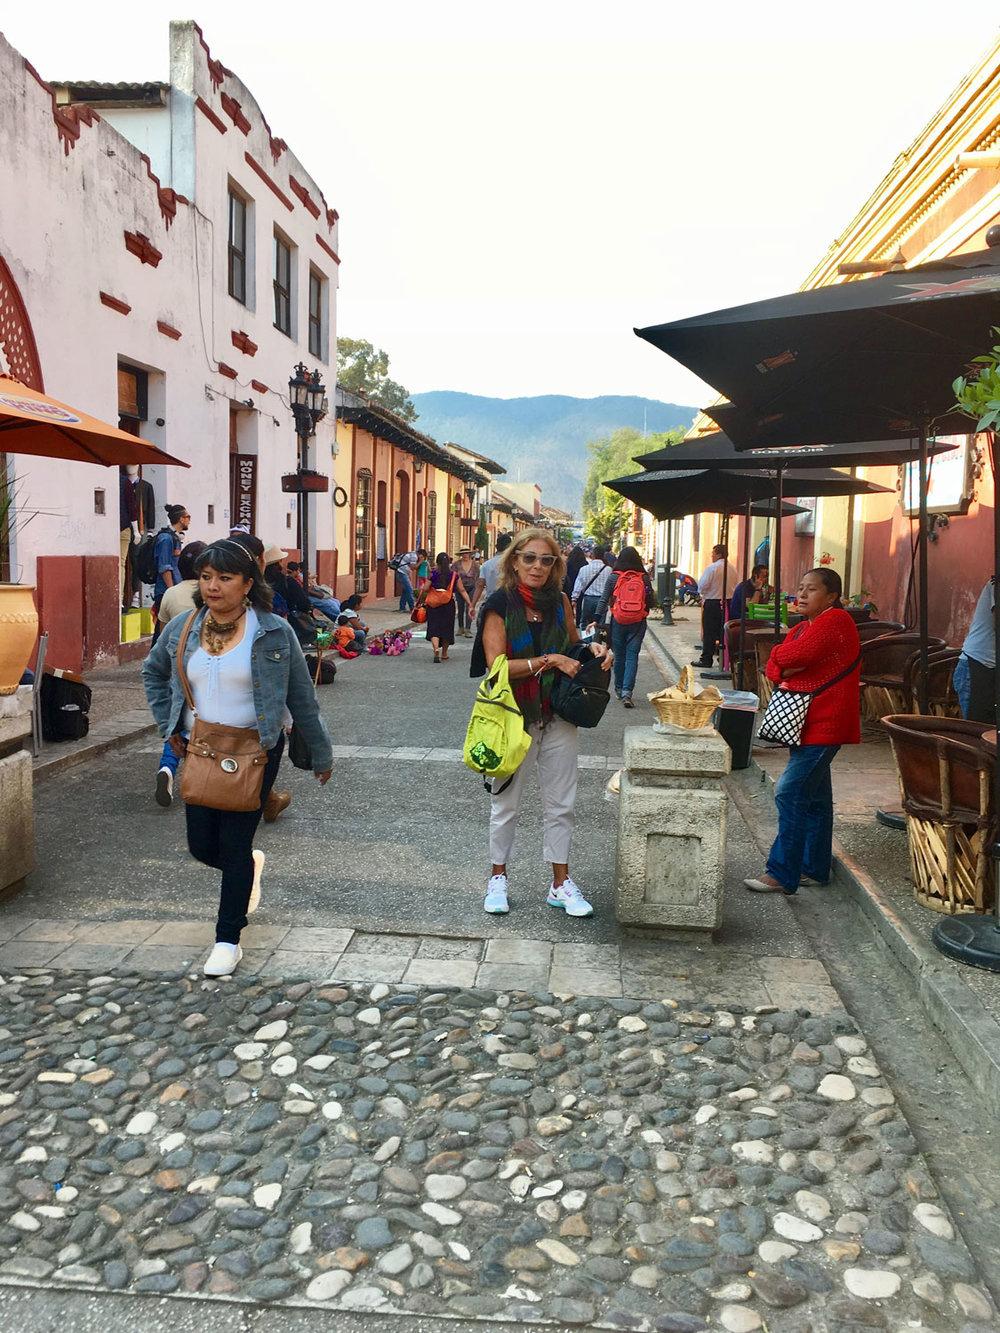 Hammocks_and_Ruins_Town_Villages_Chiapas_San_Cristobal_de_las_Casas_25.jpg